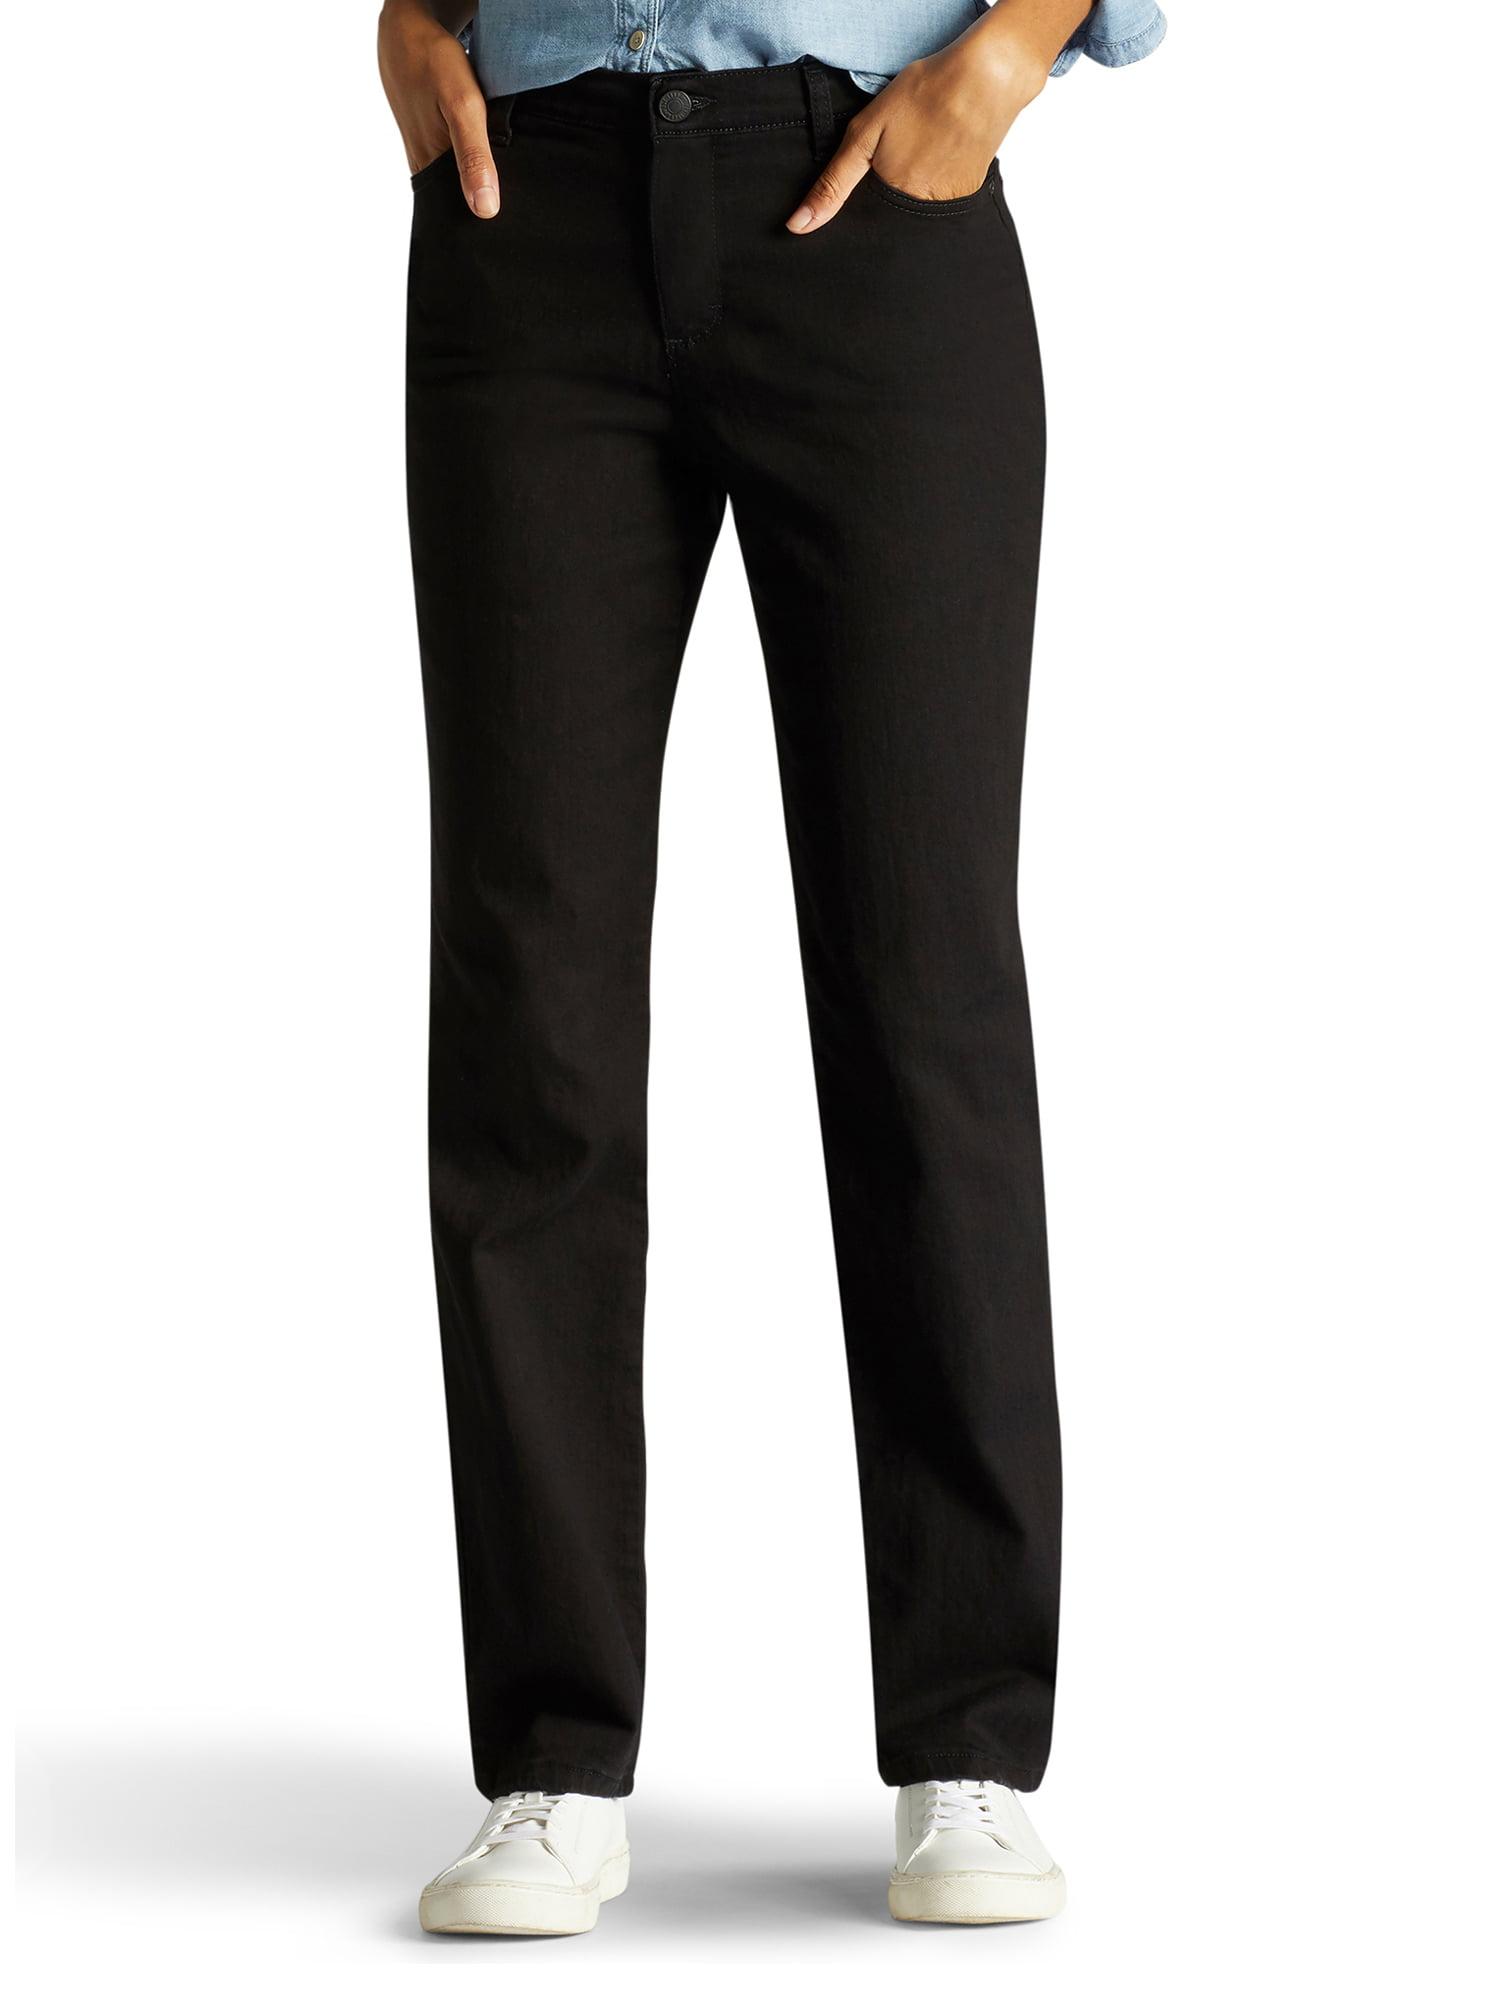 c34a88e3 Lee Jeans - Women's Instantly Slims Straight Leg Jean - Walmart.com